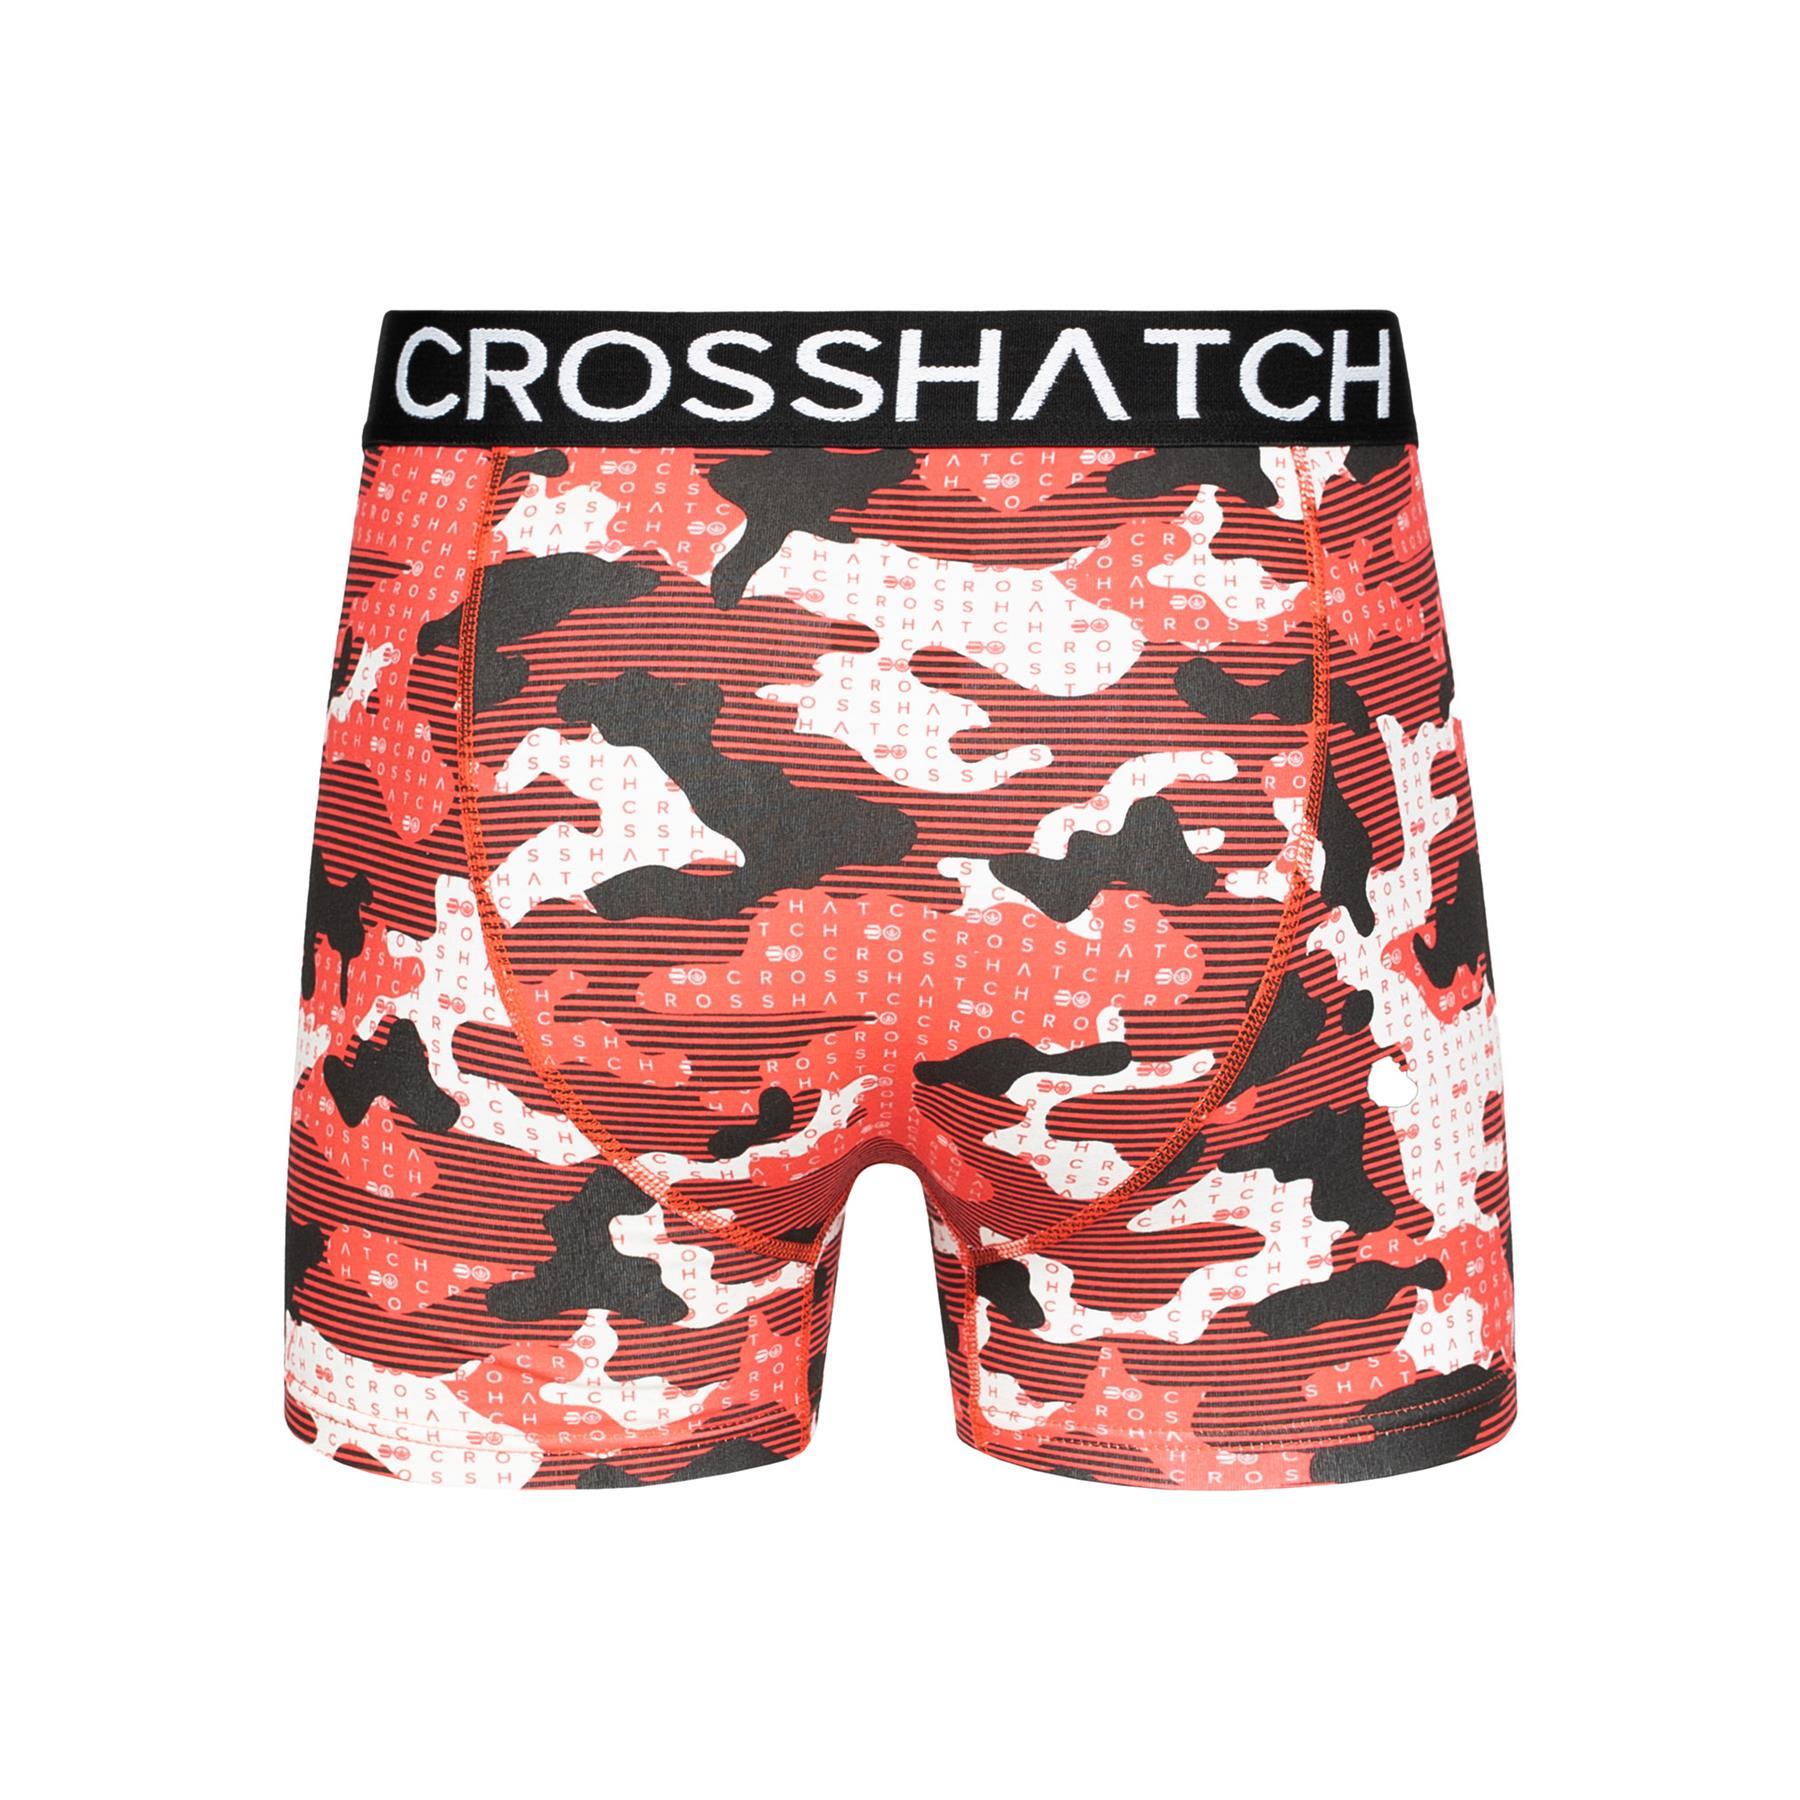 thumbnail 58 - Mens Crosshatch Boxers 3 Pack Shorts Underwear Trunks Underpants Multipack Sets